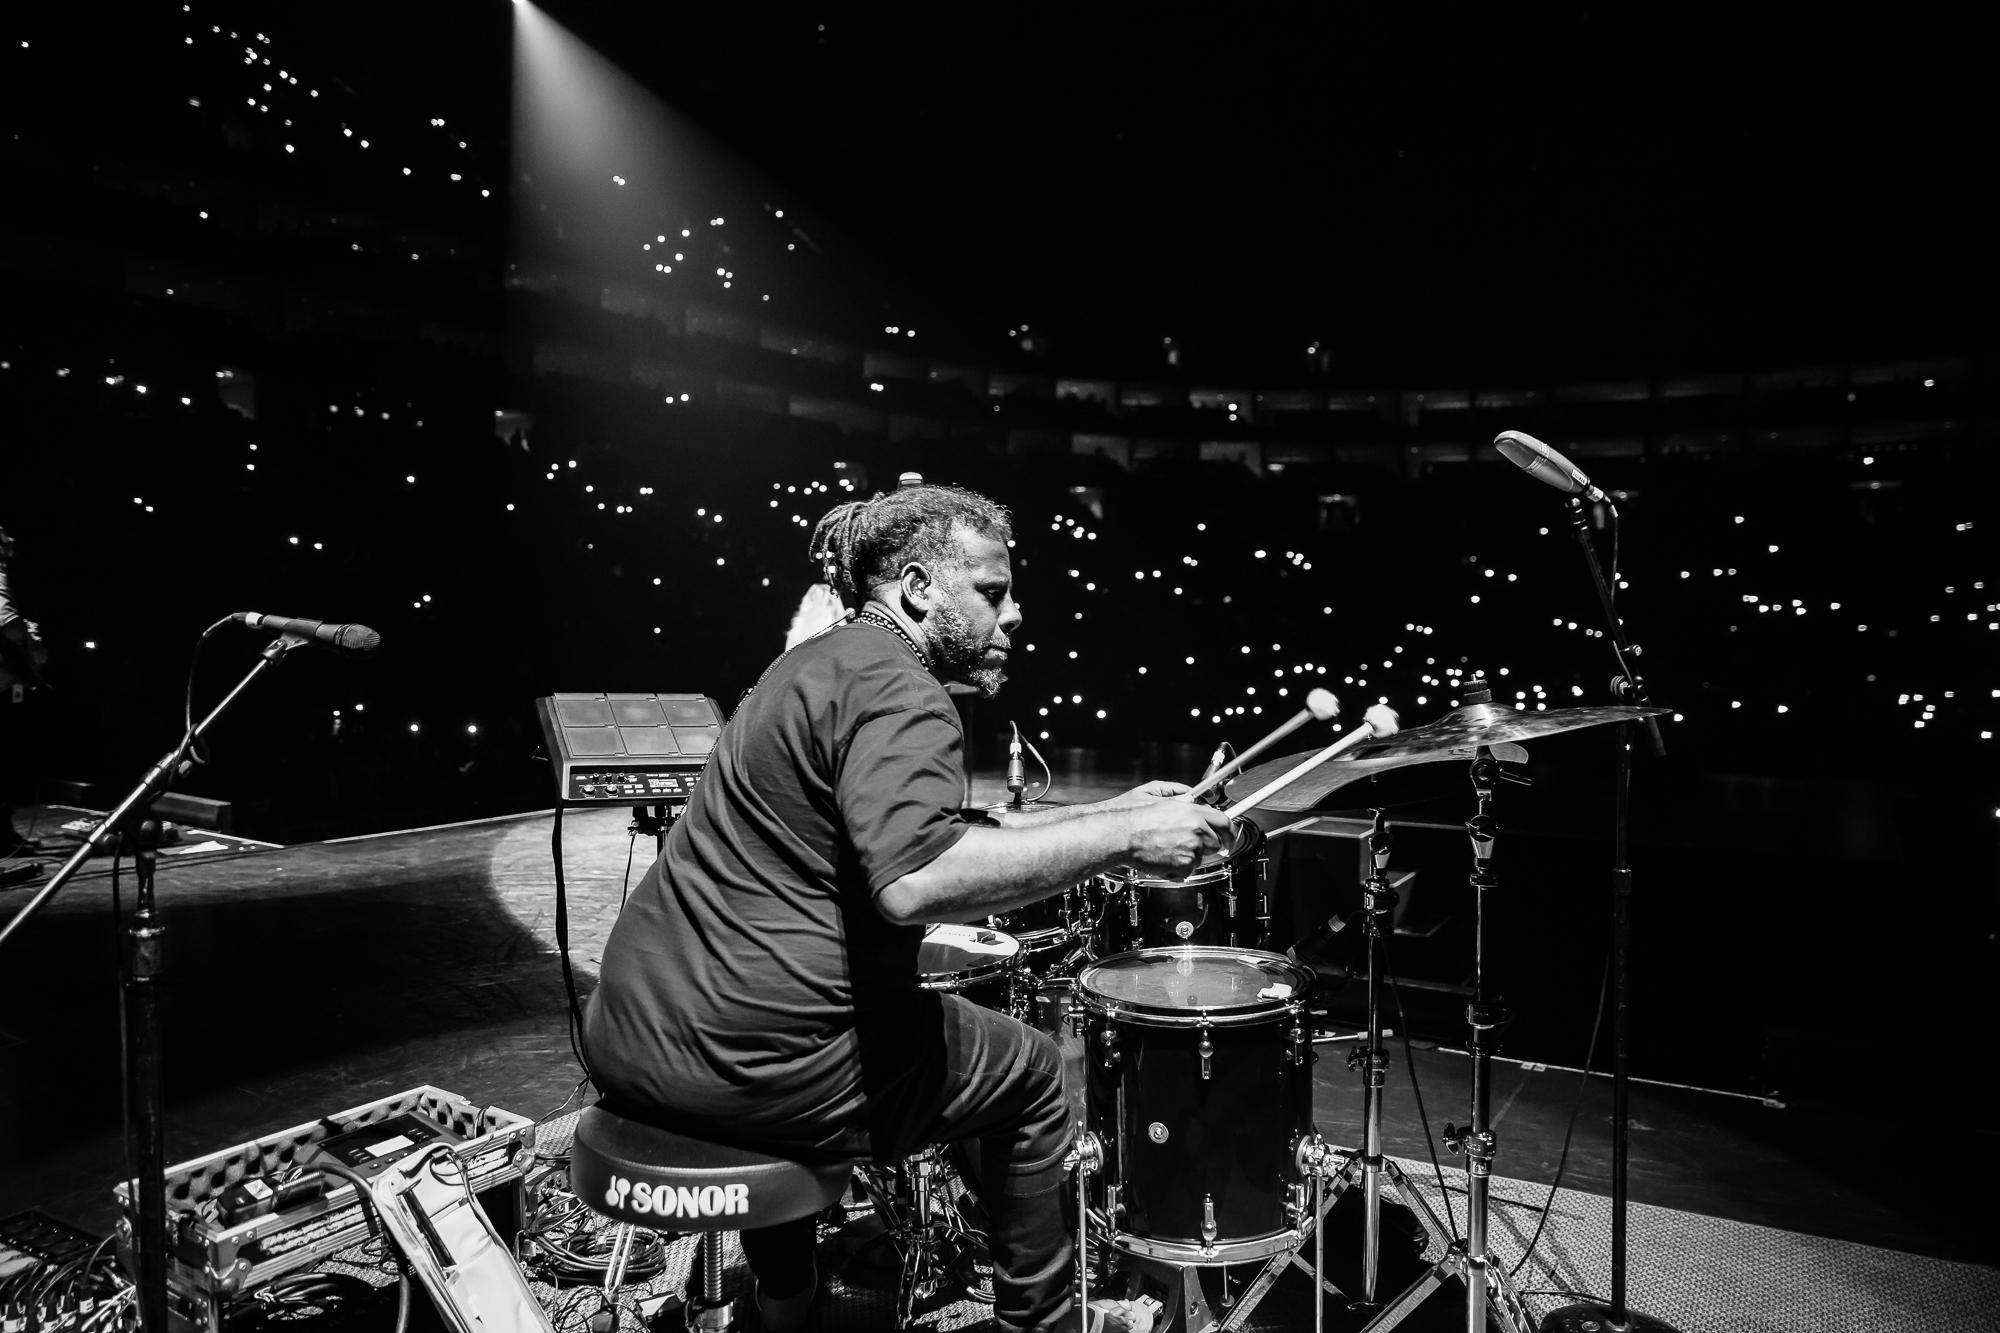 London 02 Arena